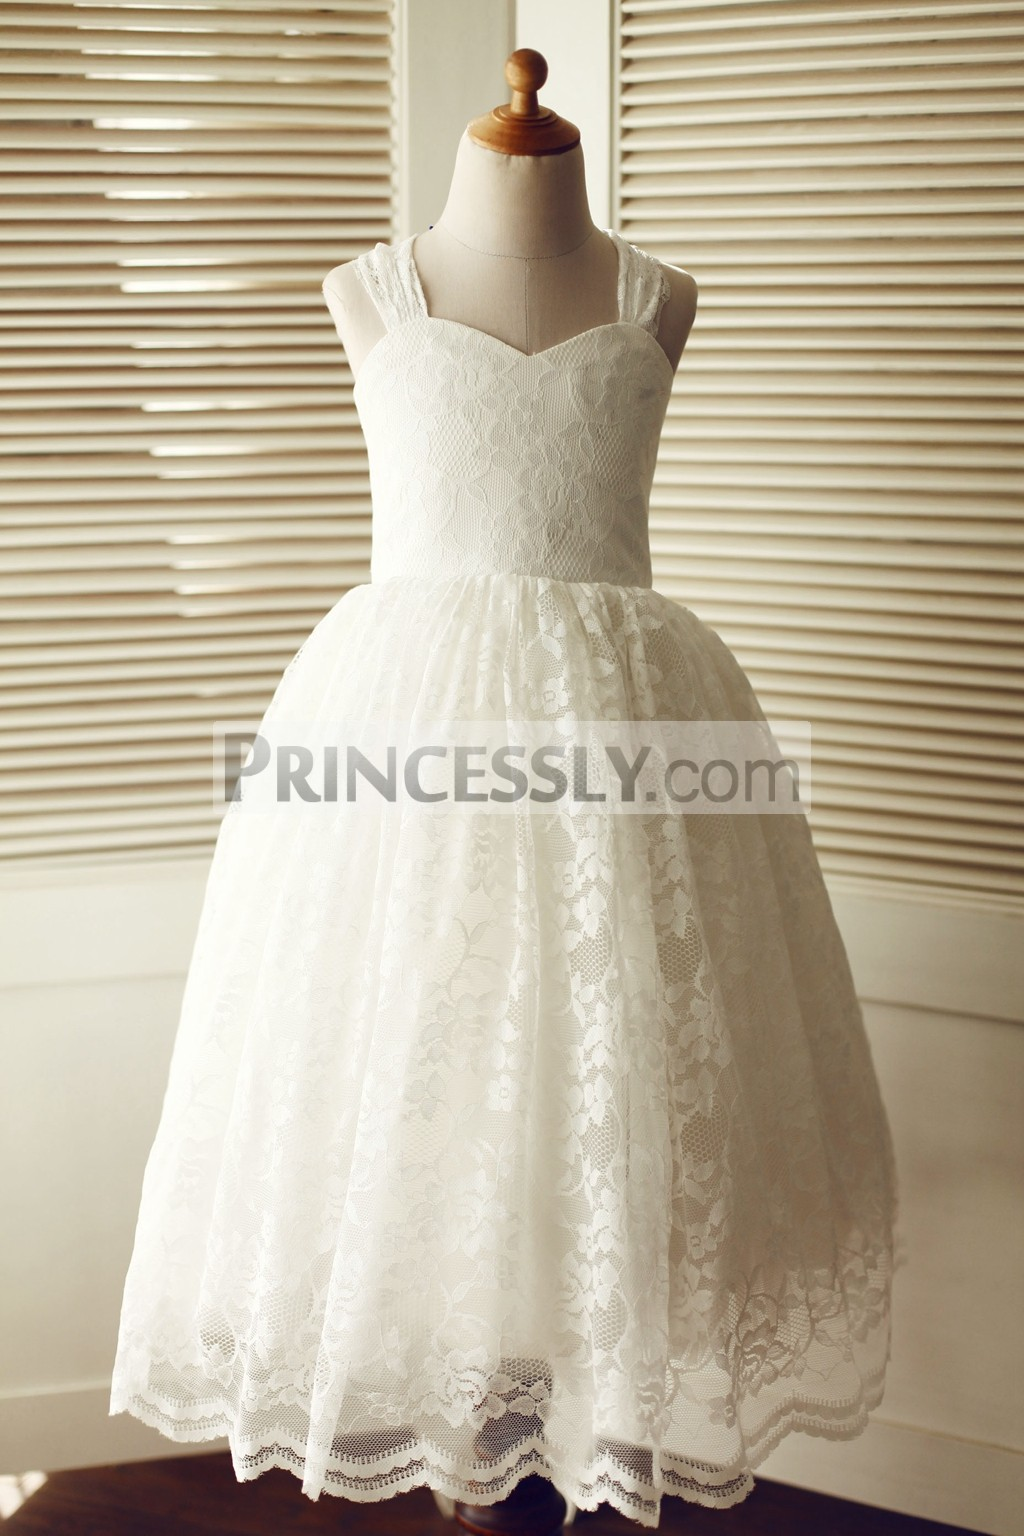 Sweetheart Straps Backless Ivory Lace Wedding Flower Girl Dress